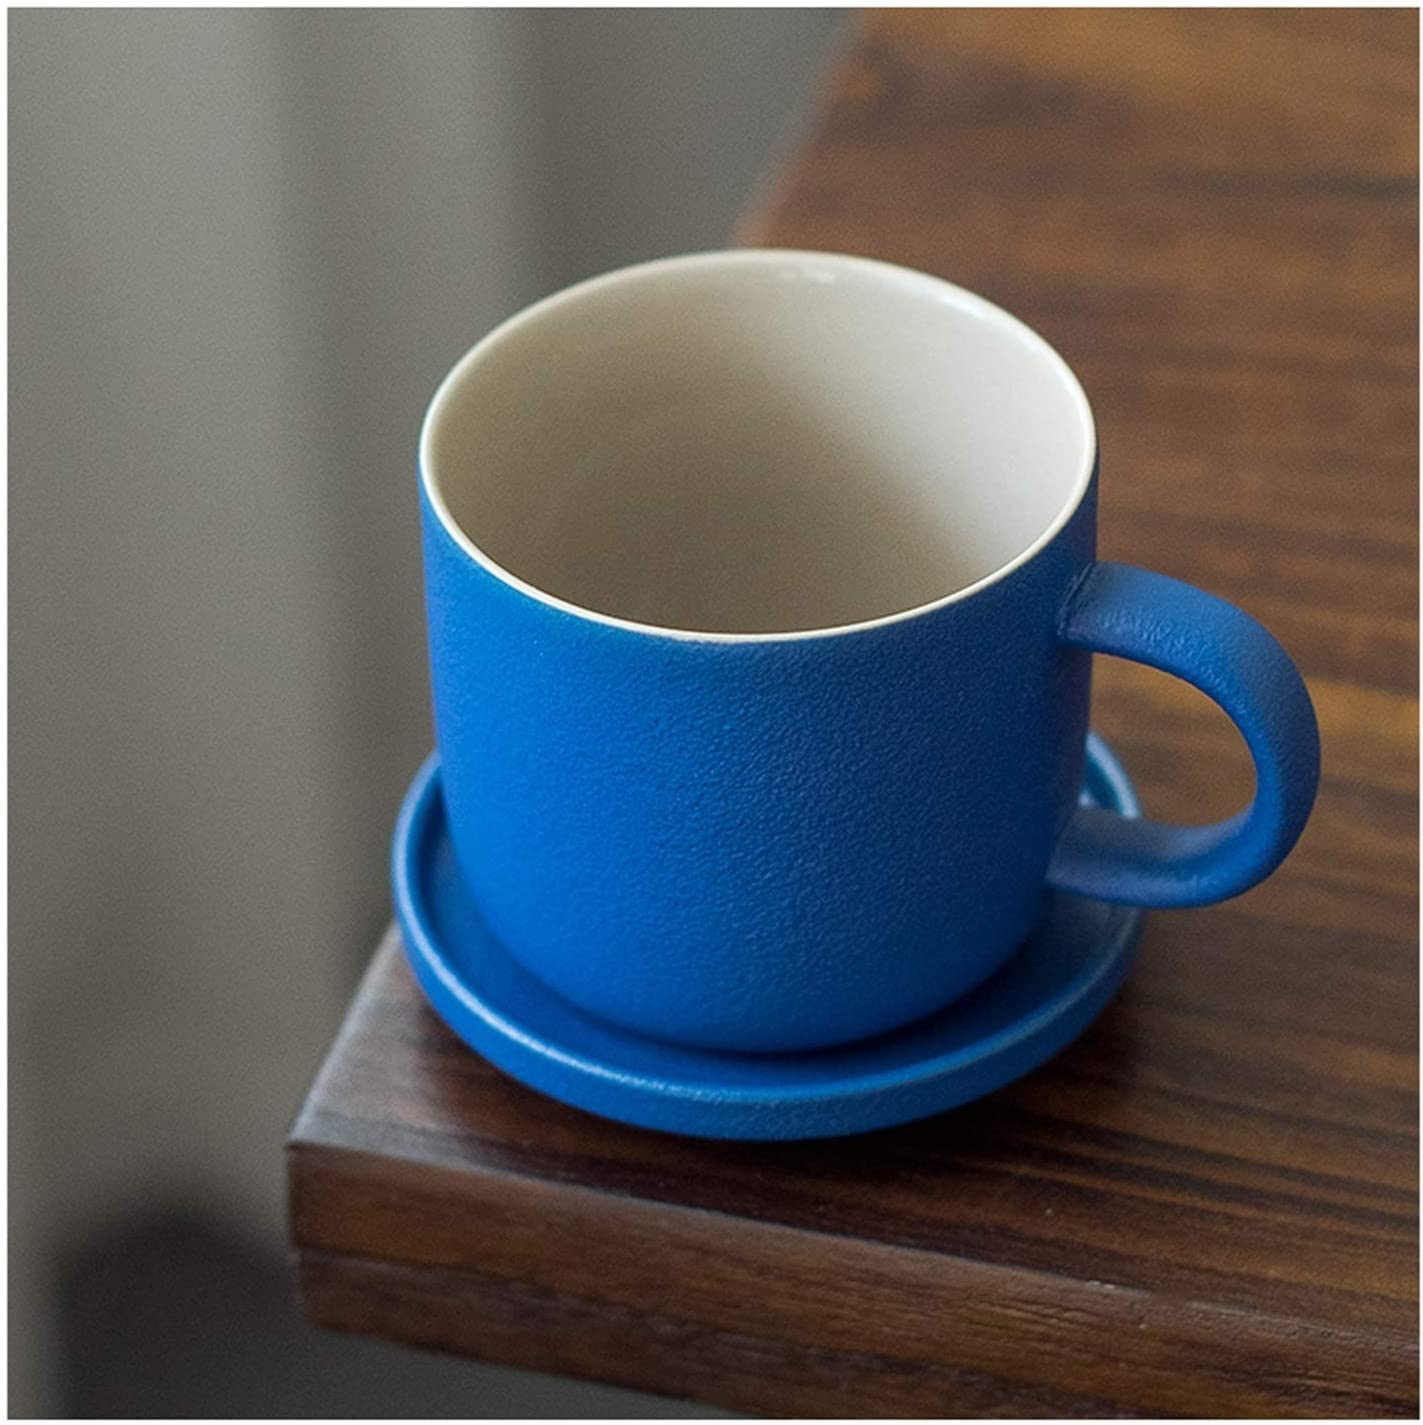 liushop Mugs 8.3oz Tea Cup New item and Saucer of 1 Porcelain Set Financial sales sale Coffee